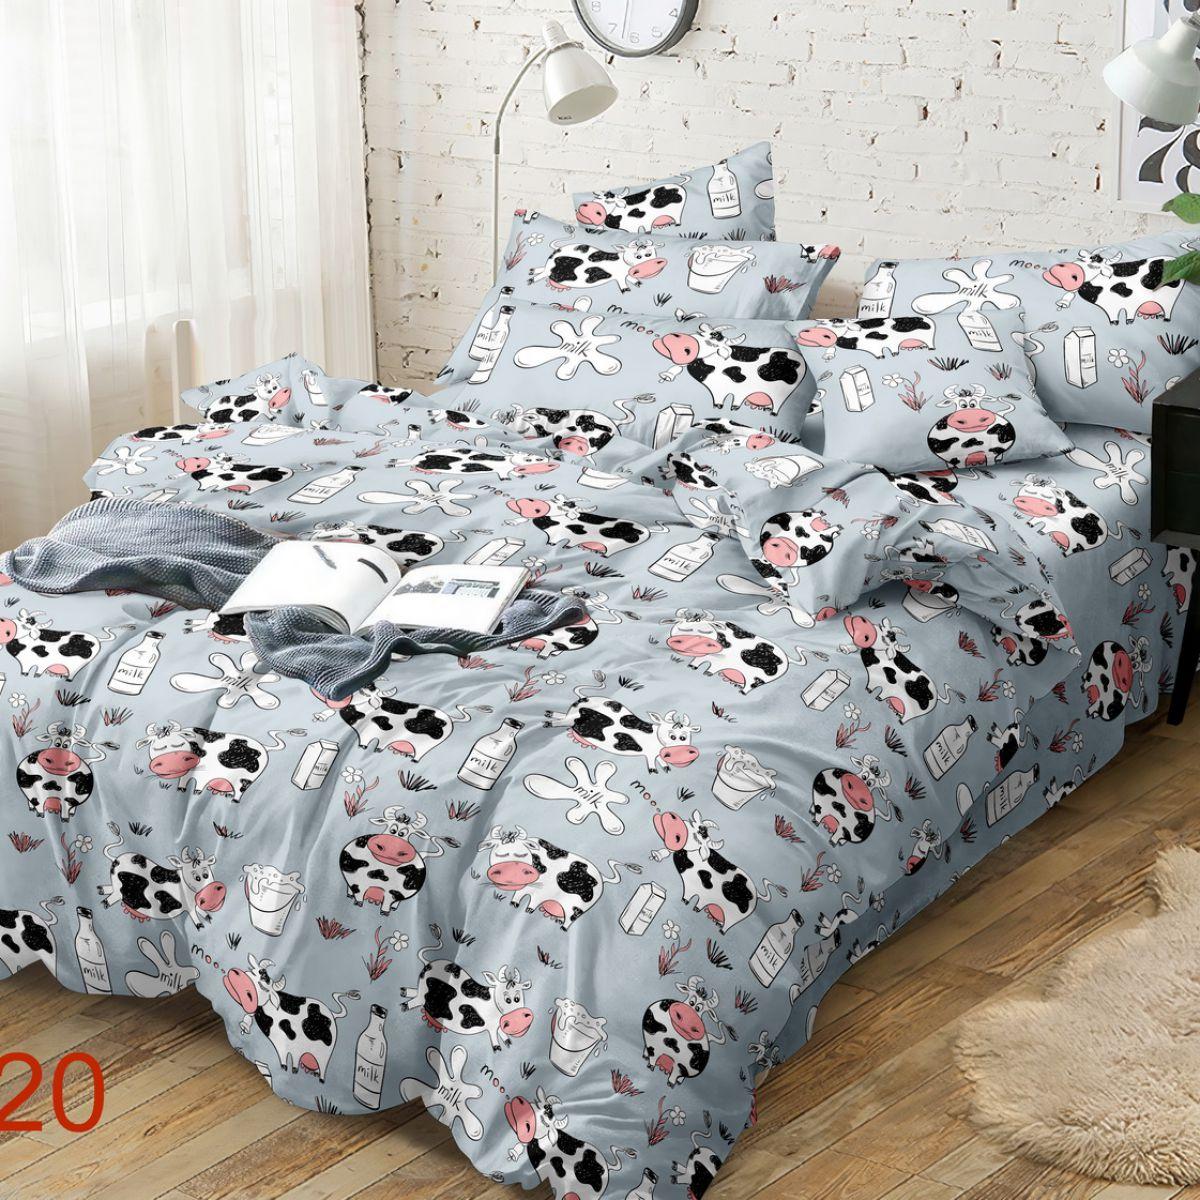 3D Beddings - Antonio - AML-4239-1 - 220x200 cm - 3 pcs